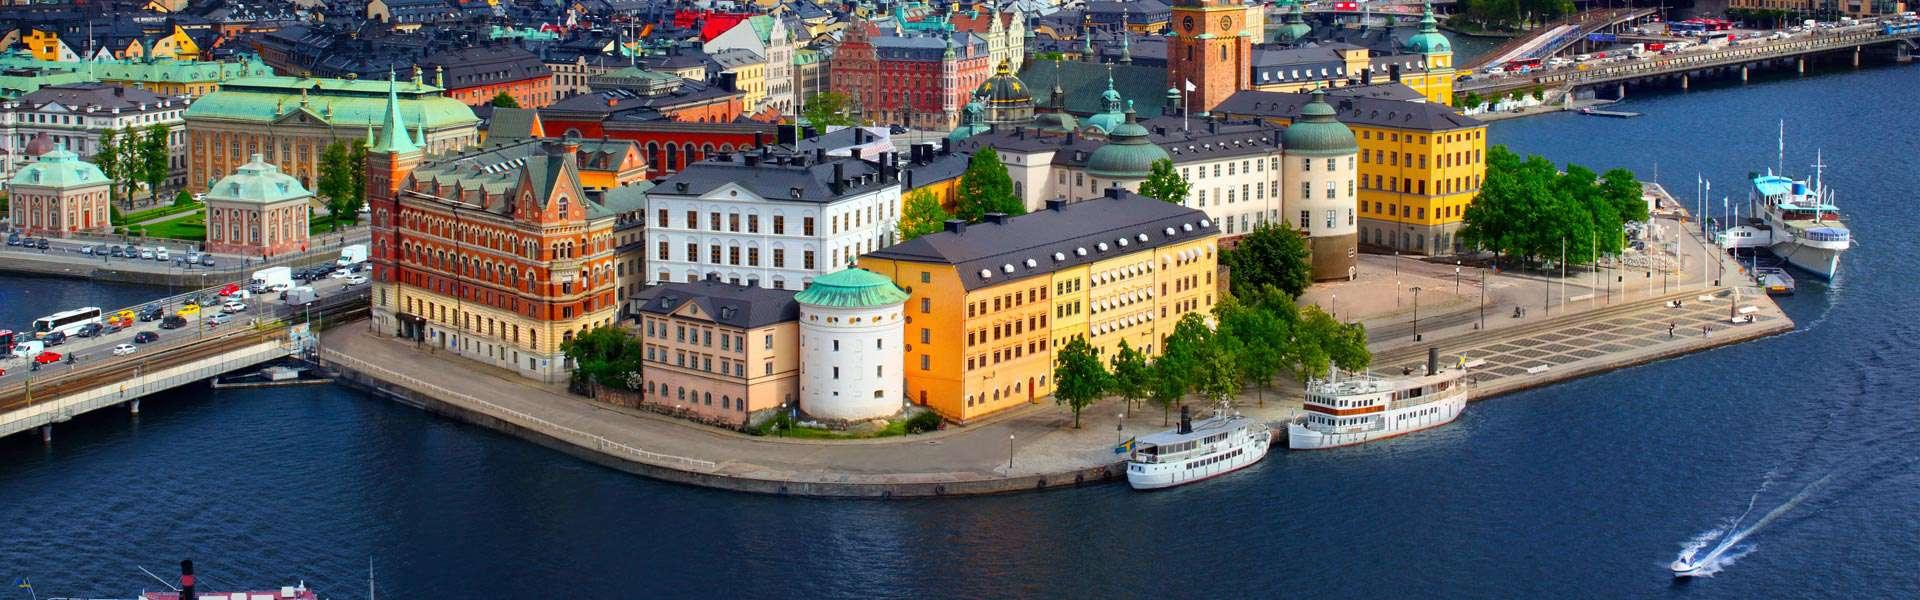 Moderne Kunst, interessant inszeniert. Das Moderna Museet in Stockholm